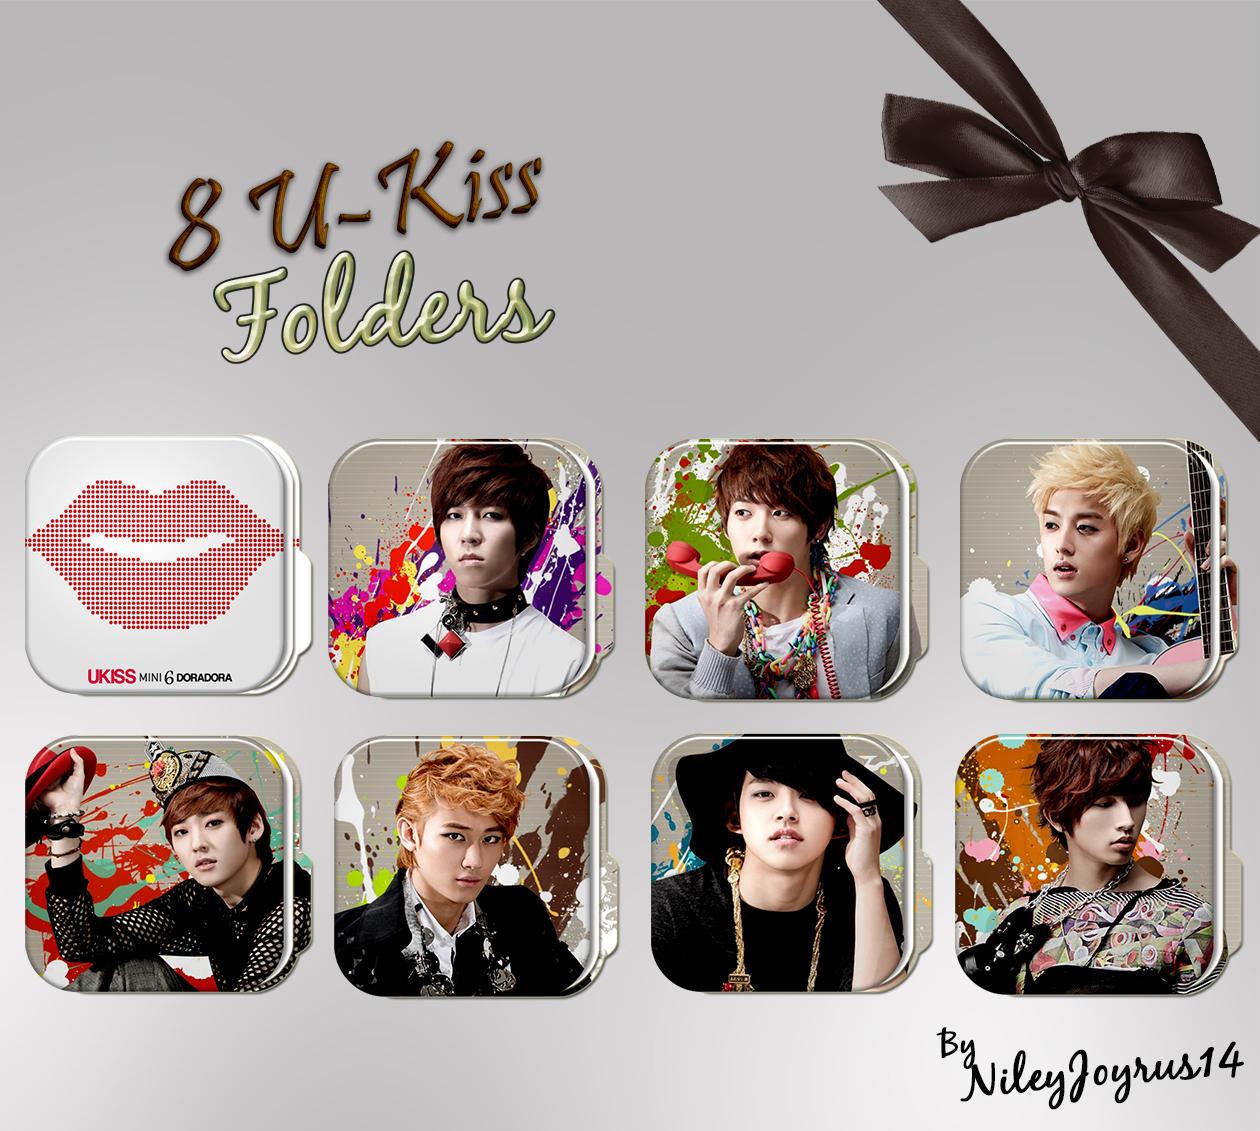 8 U-Kiss Folders (Request) by NileyJoyrus14